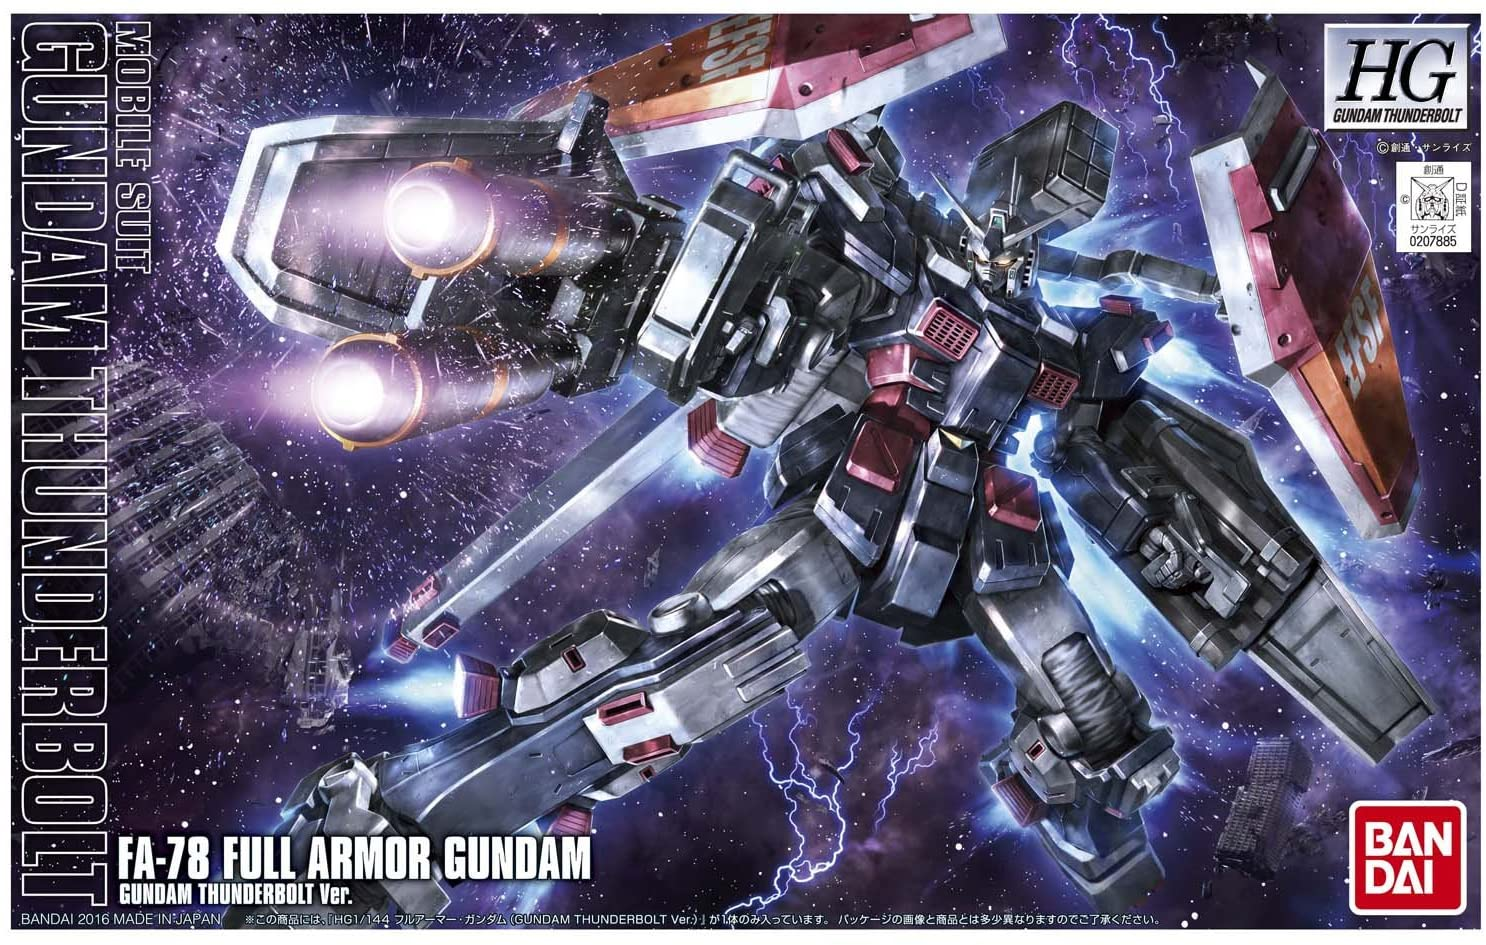 HGTB 1/144 FA-78 フルアーマー・ガンダム(GUNDAM THUNDERBOLT Ver.) [Full Armor Gundam (Gundam Thunderbolt ONA Ver.)] 0207885